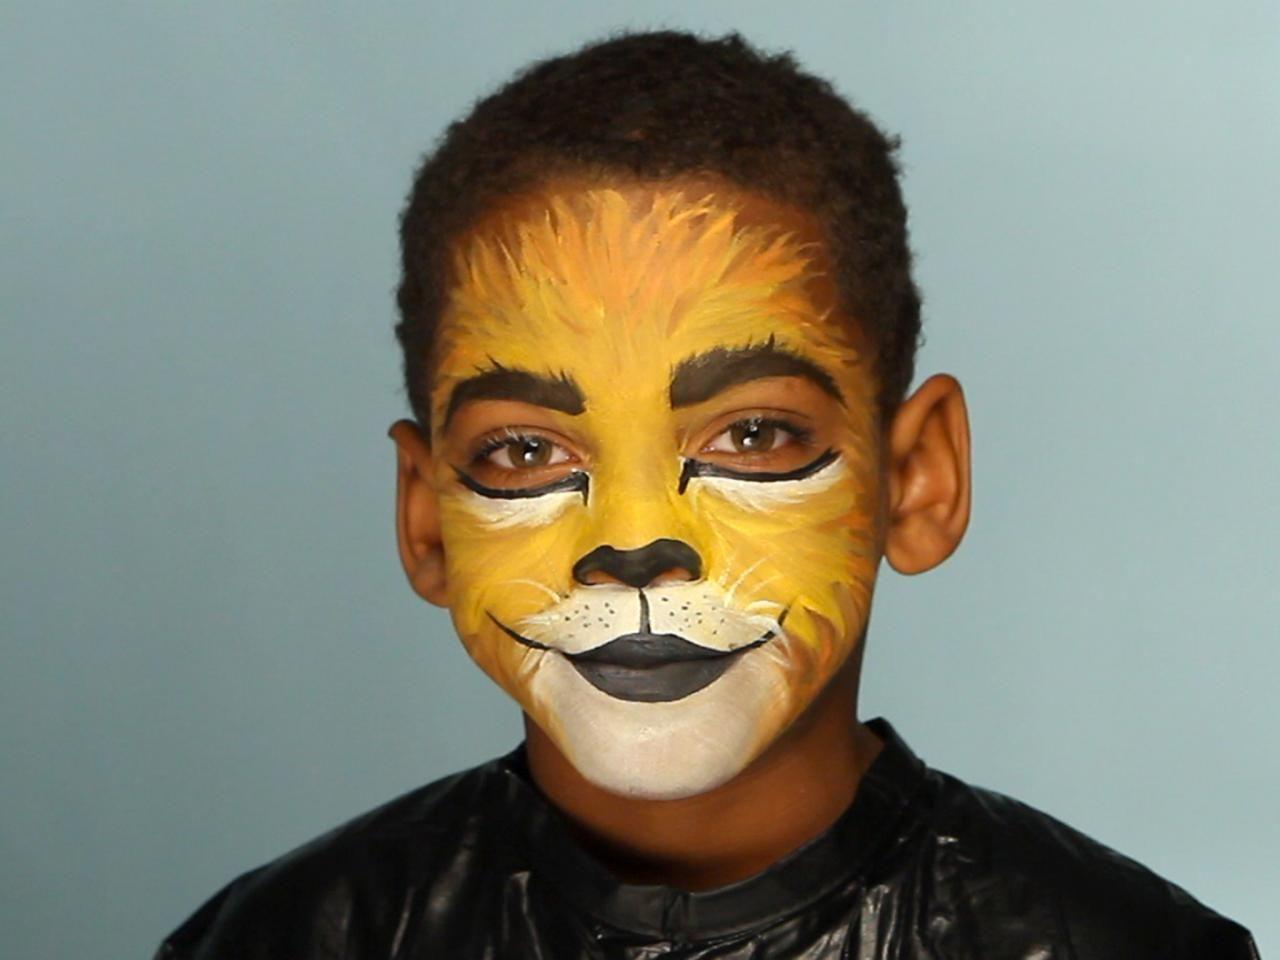 Kid's Halloween Makeup Tutorial: Lion | Lions, Costume makeup and ...